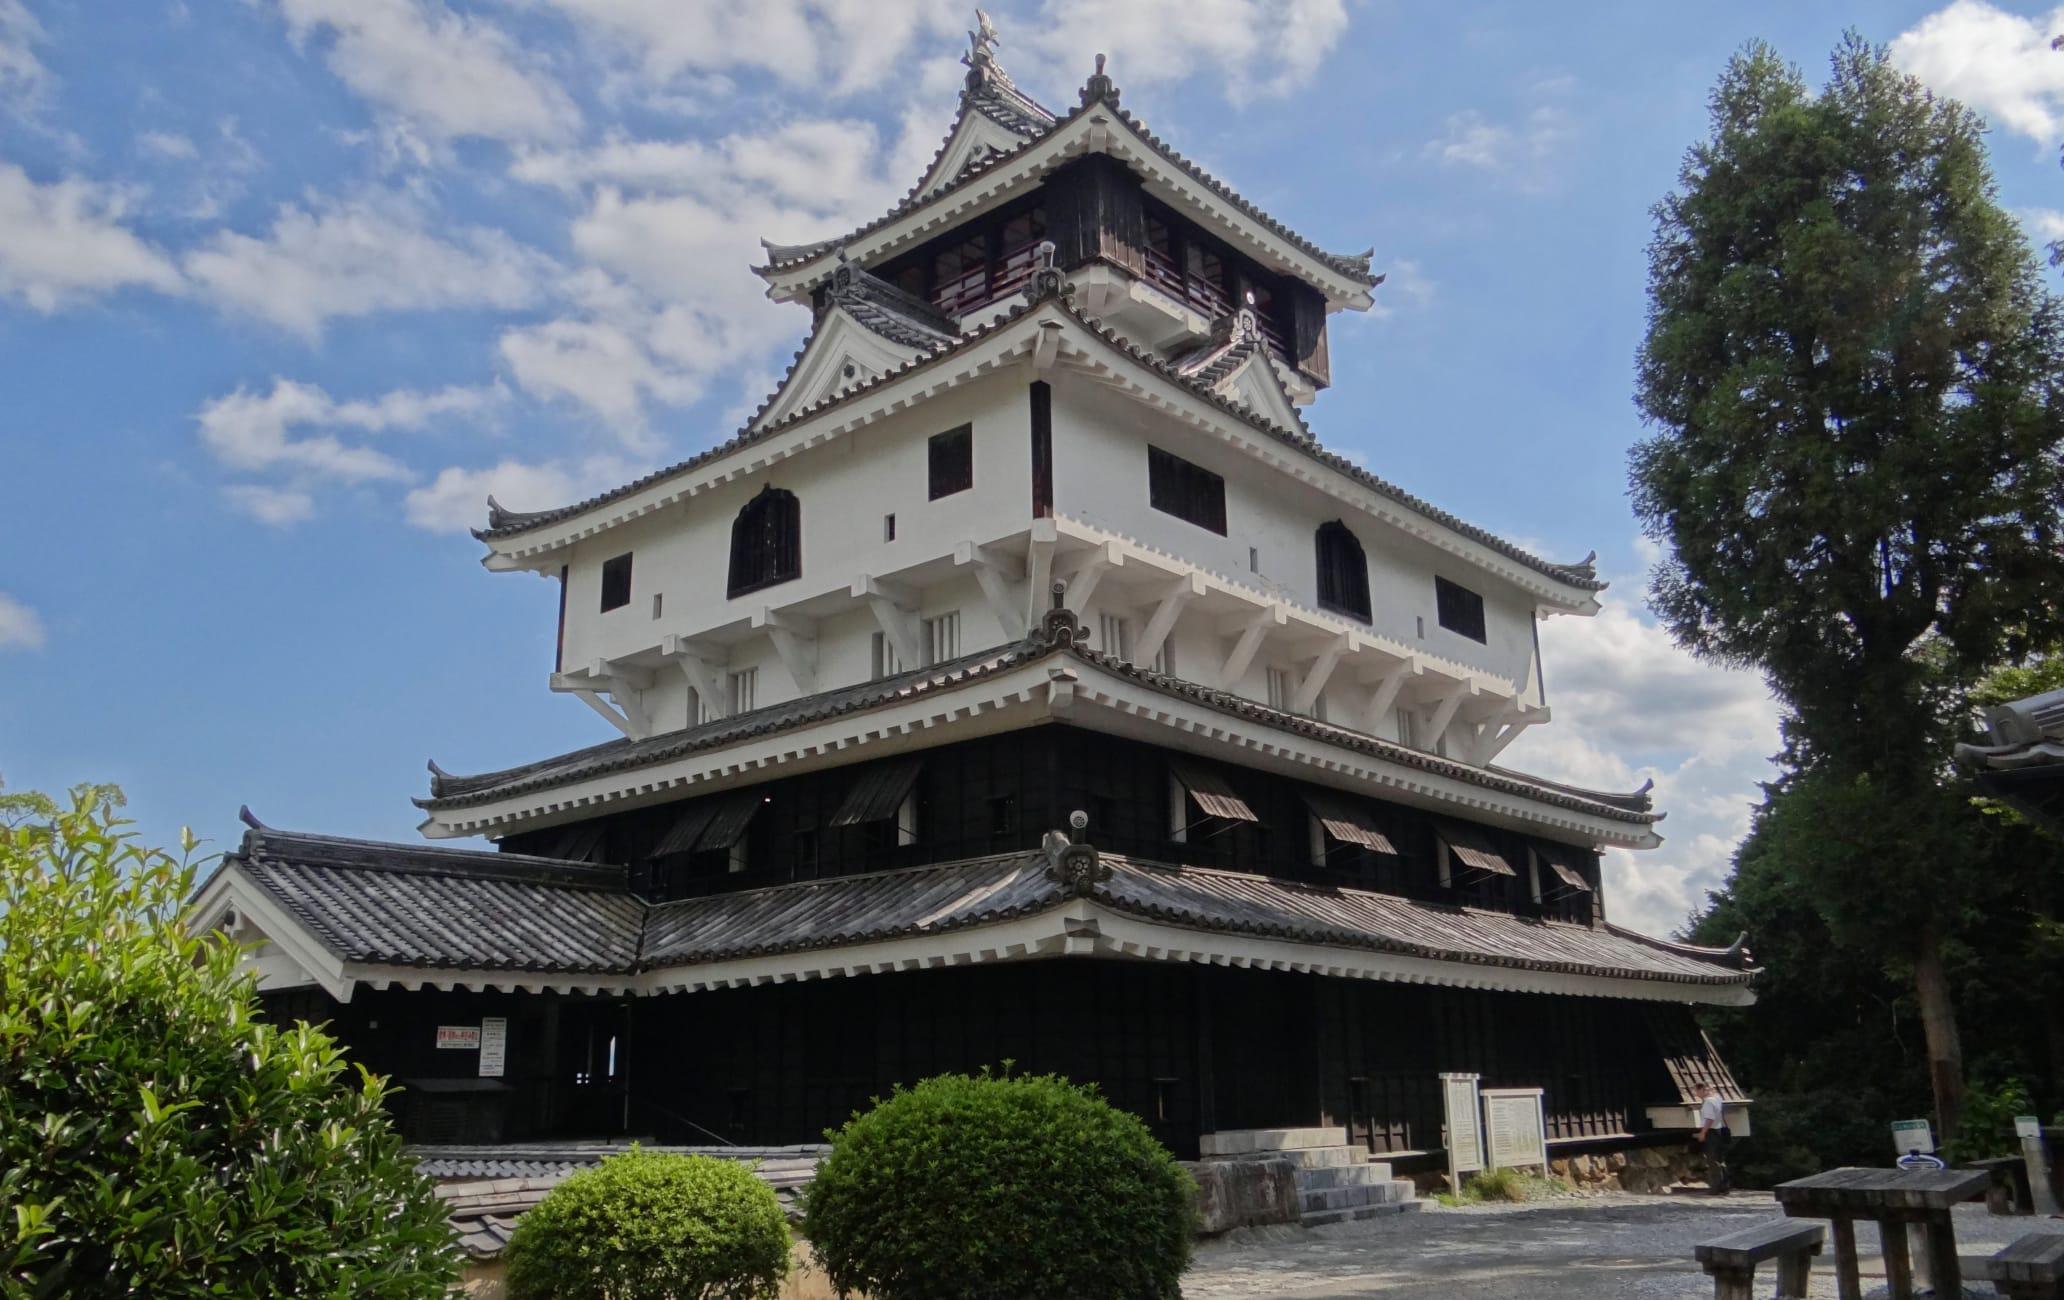 Iwakuni Castle